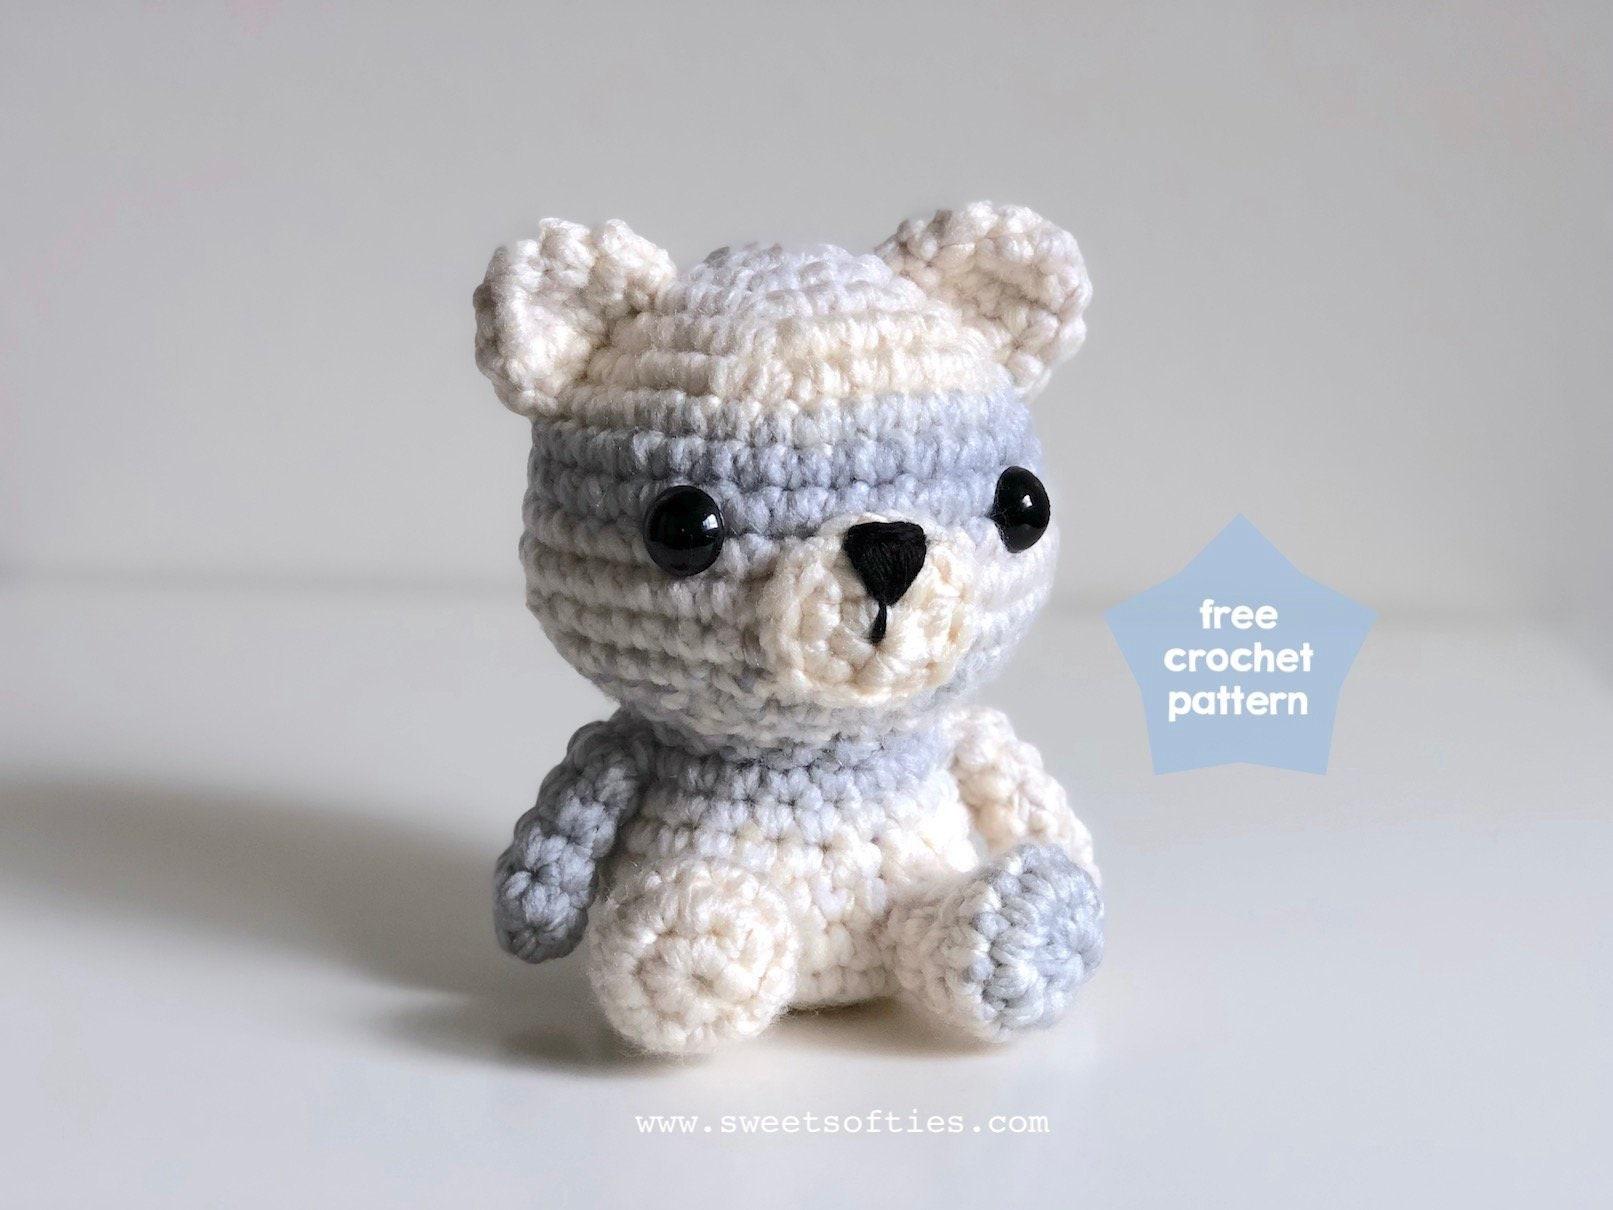 Free Amigurumi Crochet Pattern Tutorial Peyton The Polar Bear Etsy